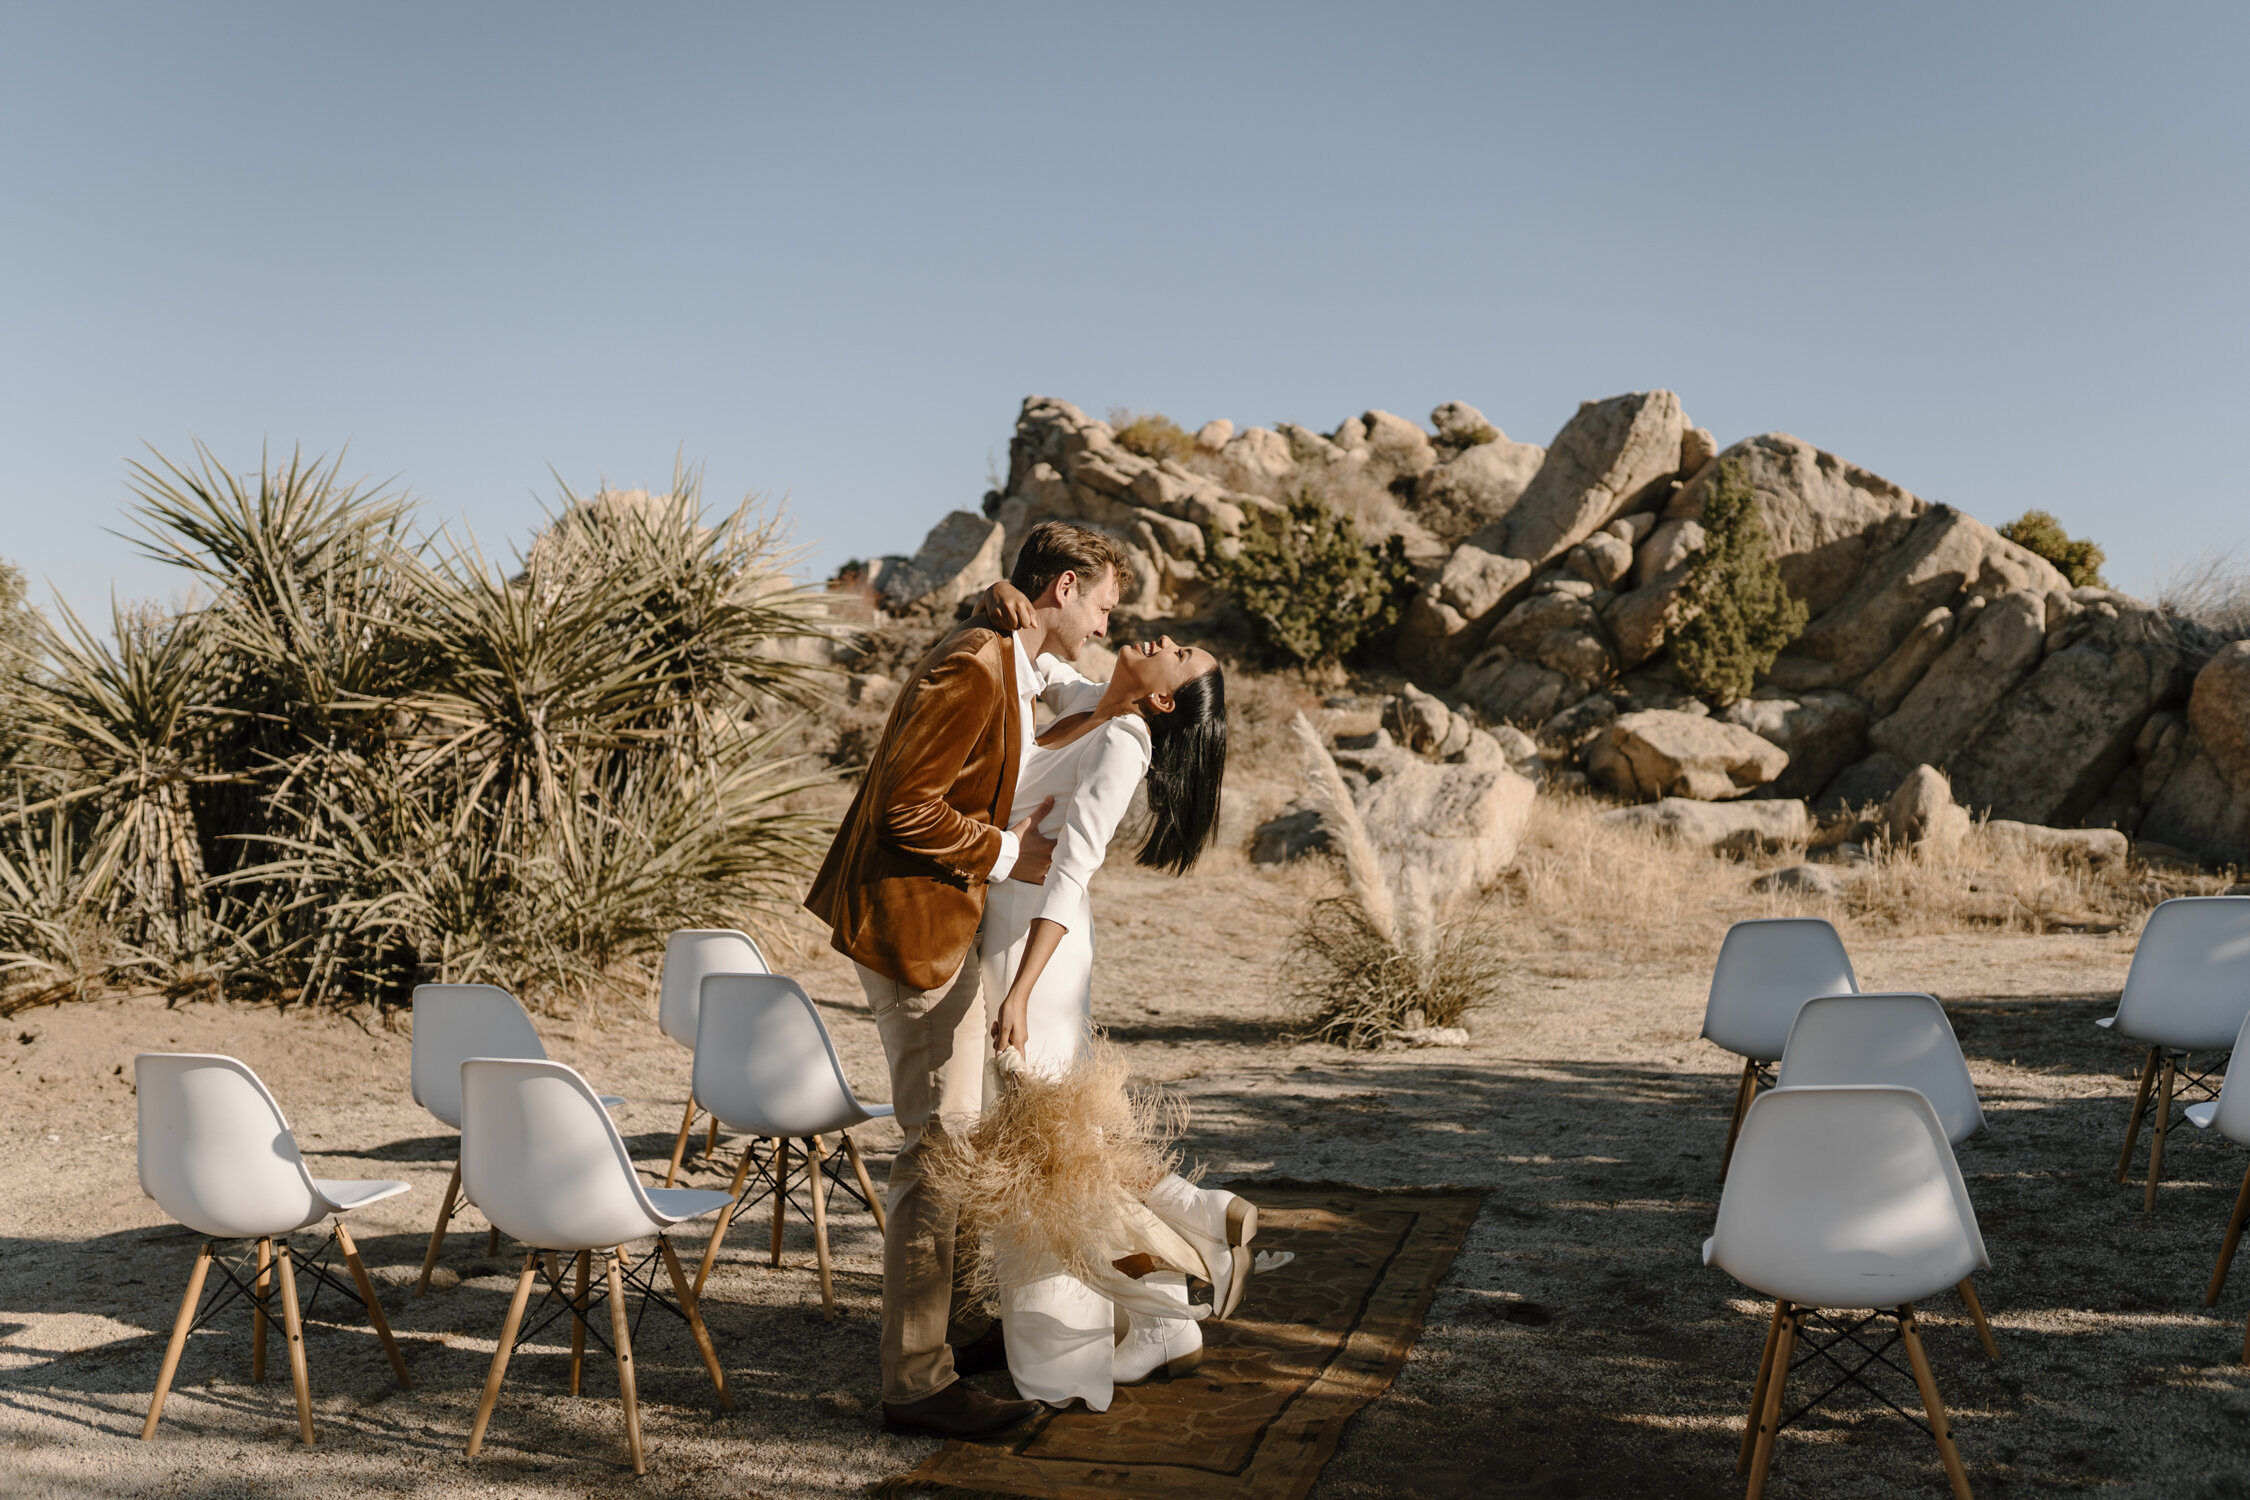 Adventurous Joshua Tree, California Elopement | Kayli LaFon Photography, Intimate Wedding & Destination Elopement Photographer